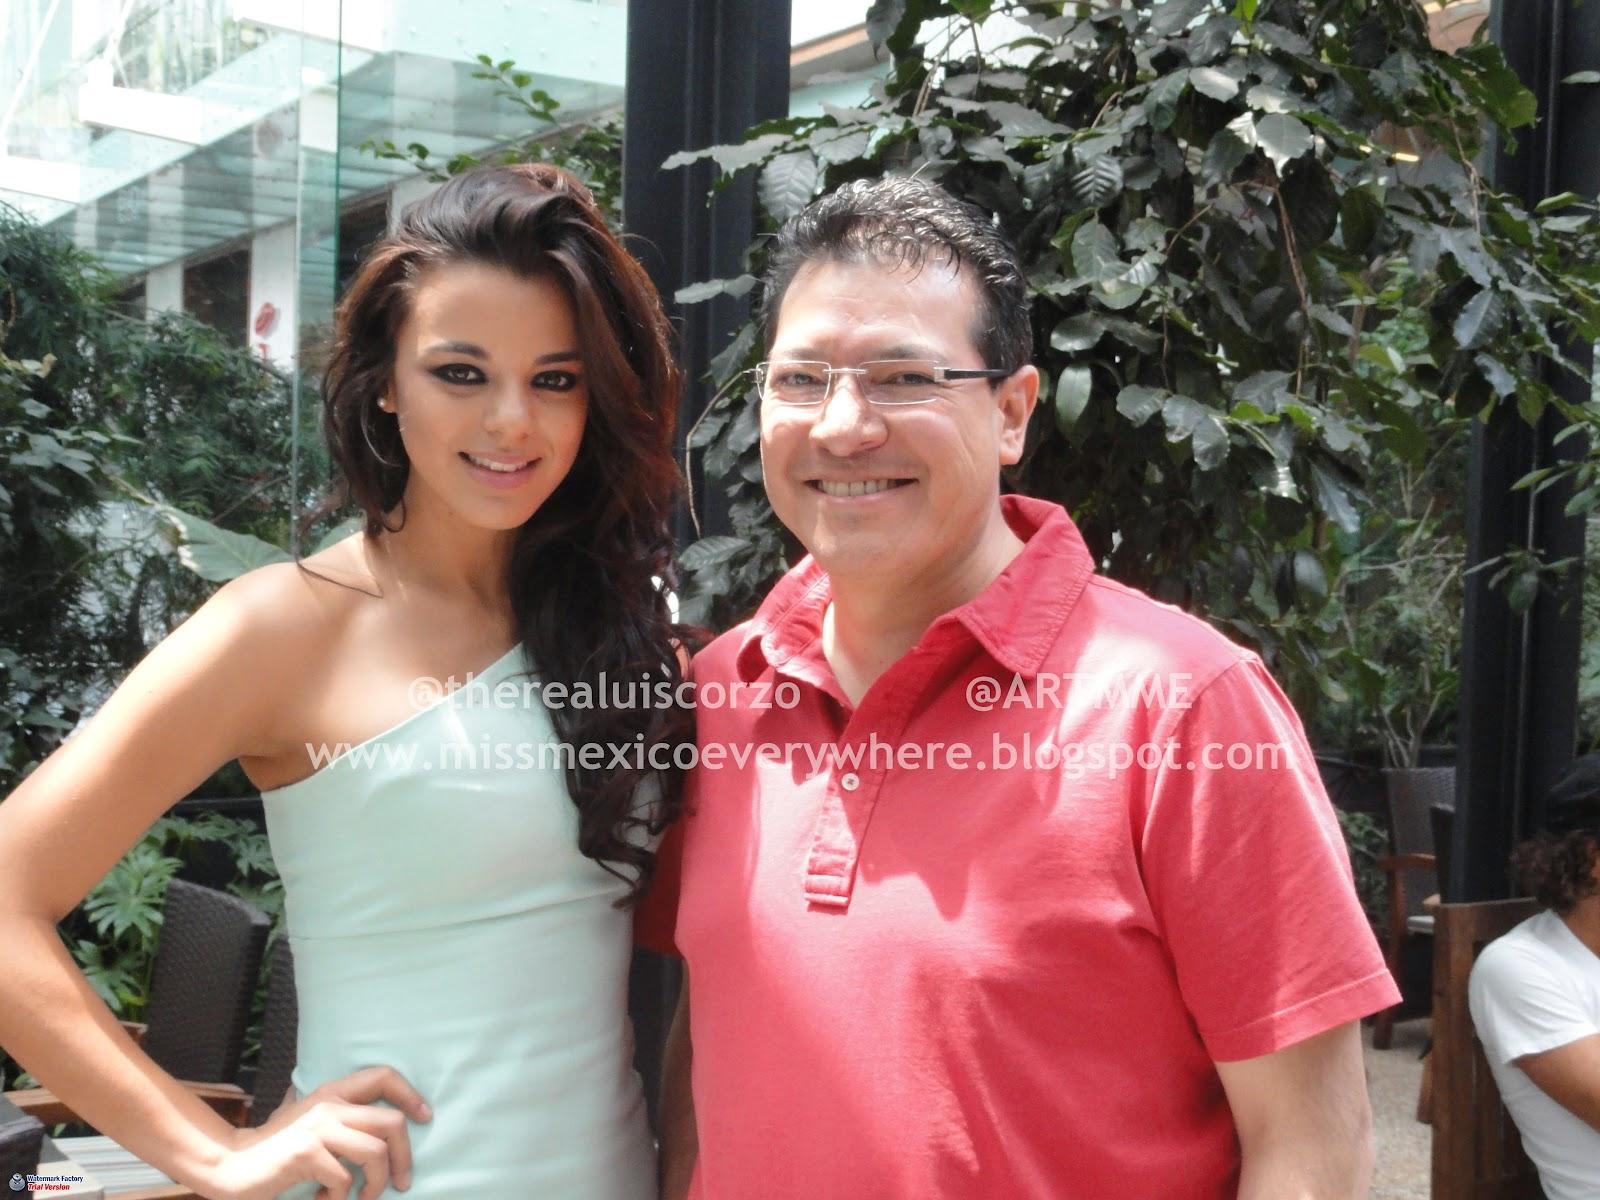 Desayuno Tlaxcalteca | Miss Mexico Everywhere \